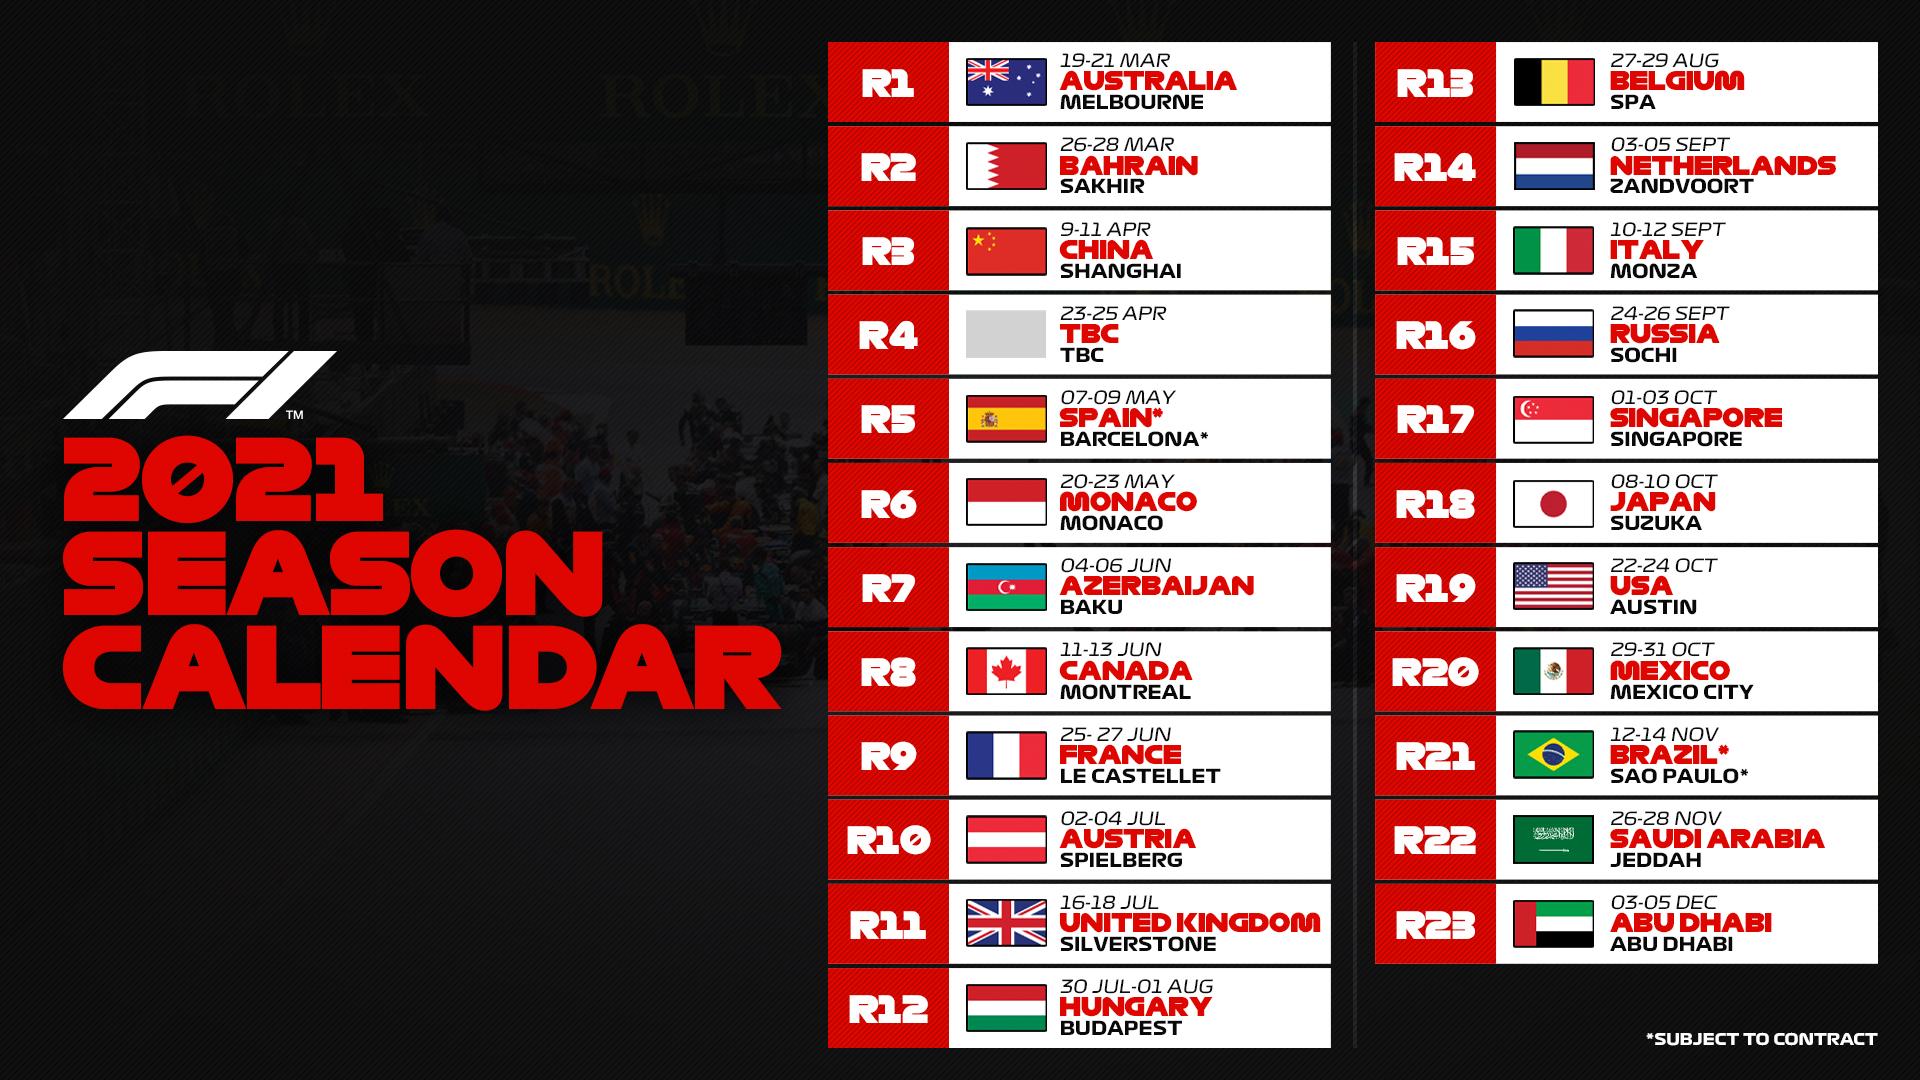 F1 releases provisional 2021 calendar | GRAND PRIX 247